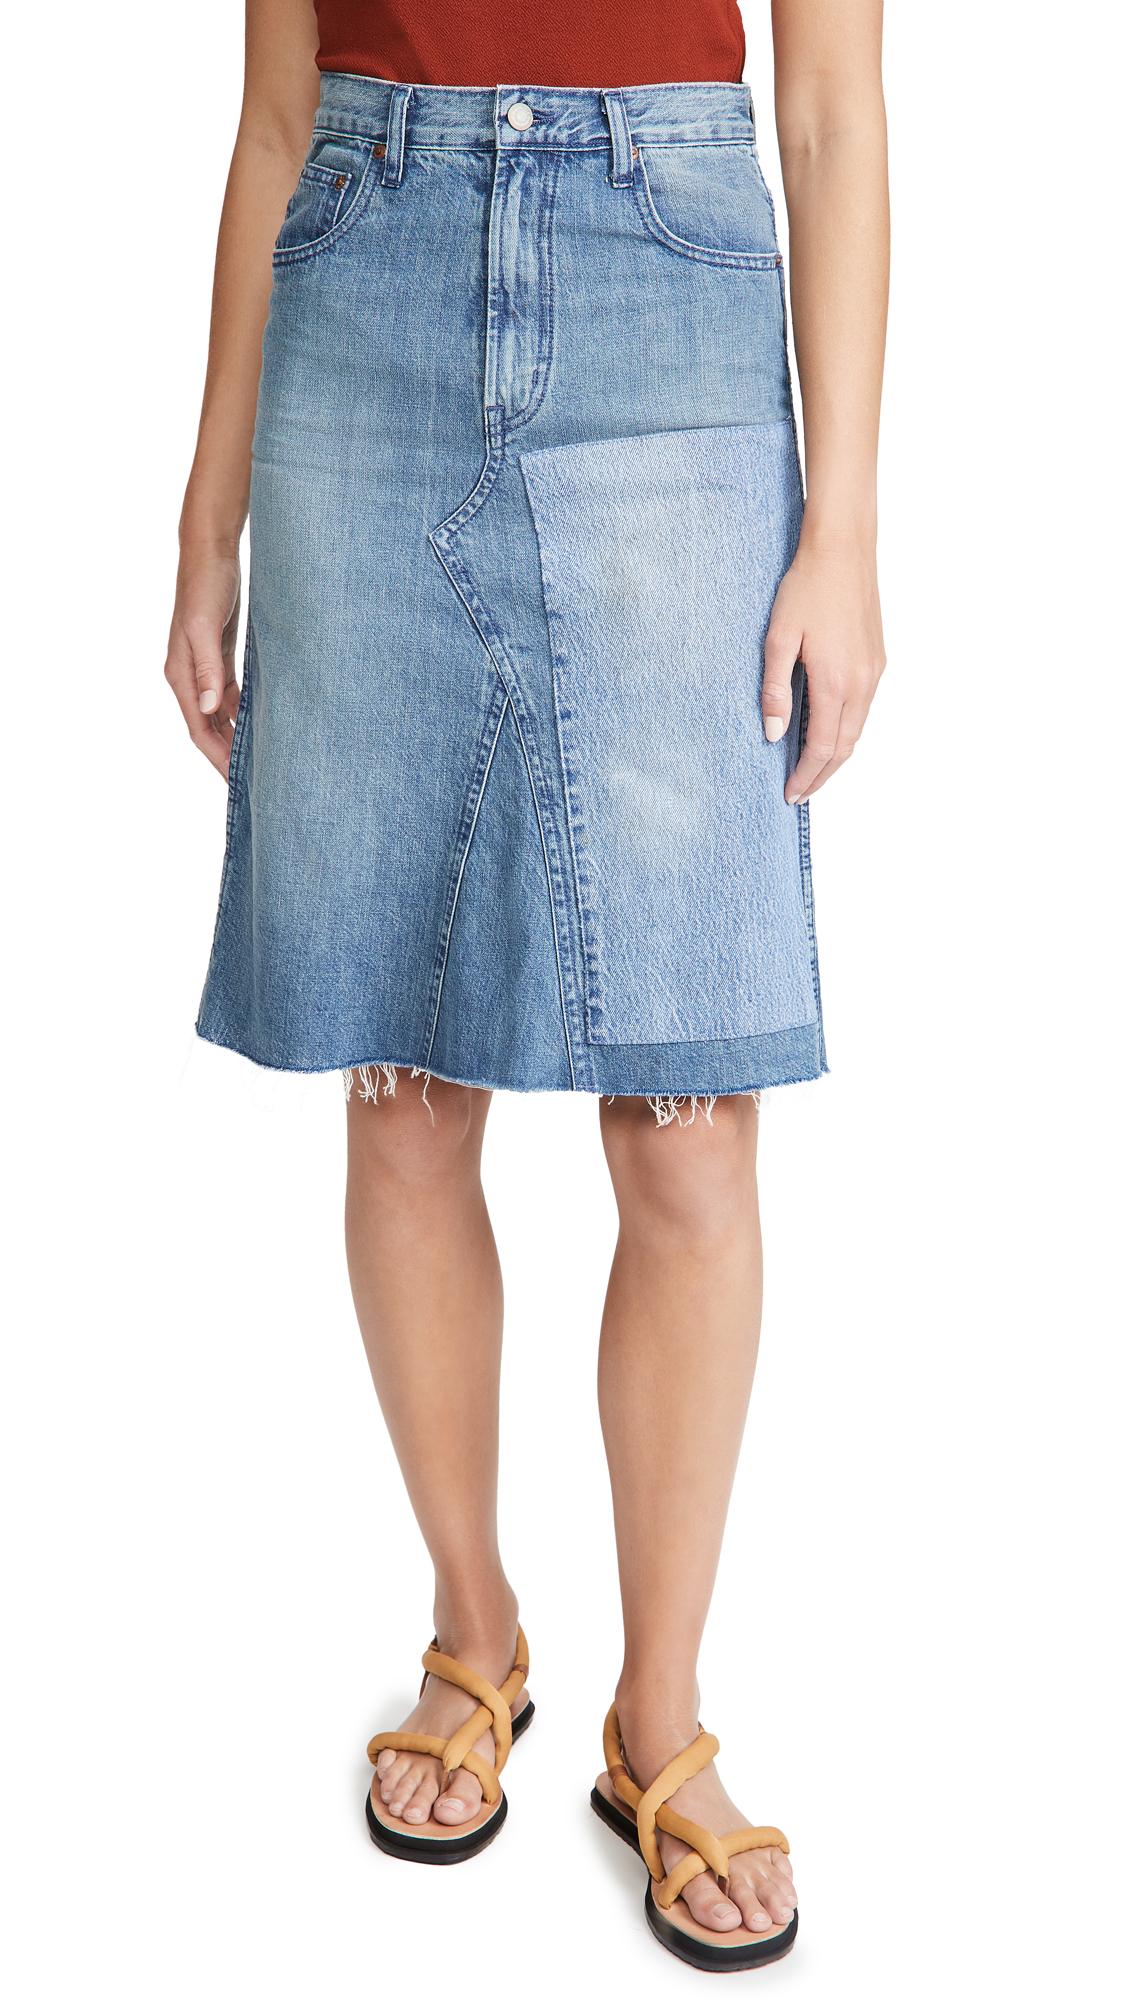 B Sides Plein Skirt